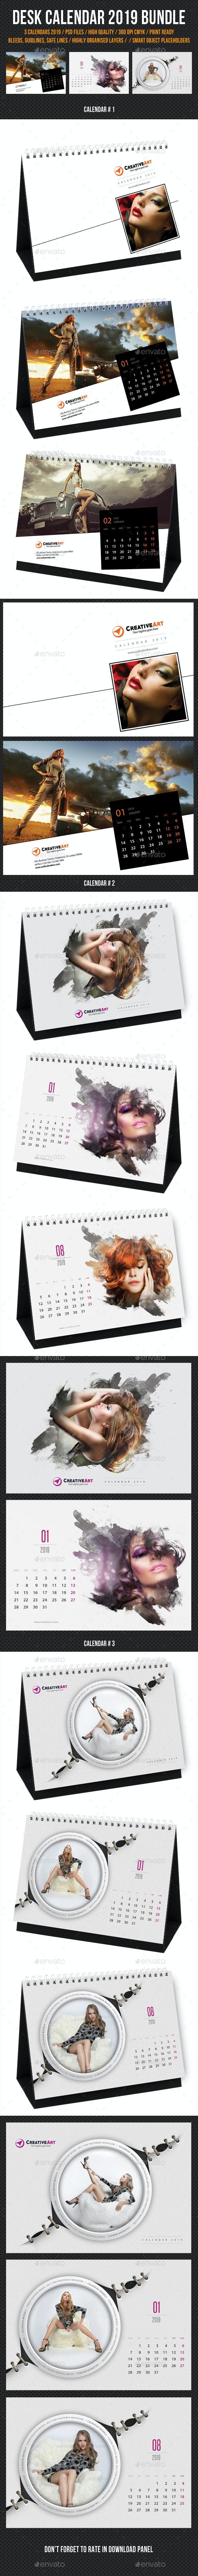 Creative Desk Calendar 2019 Bundle 05 - Calendars Stationery